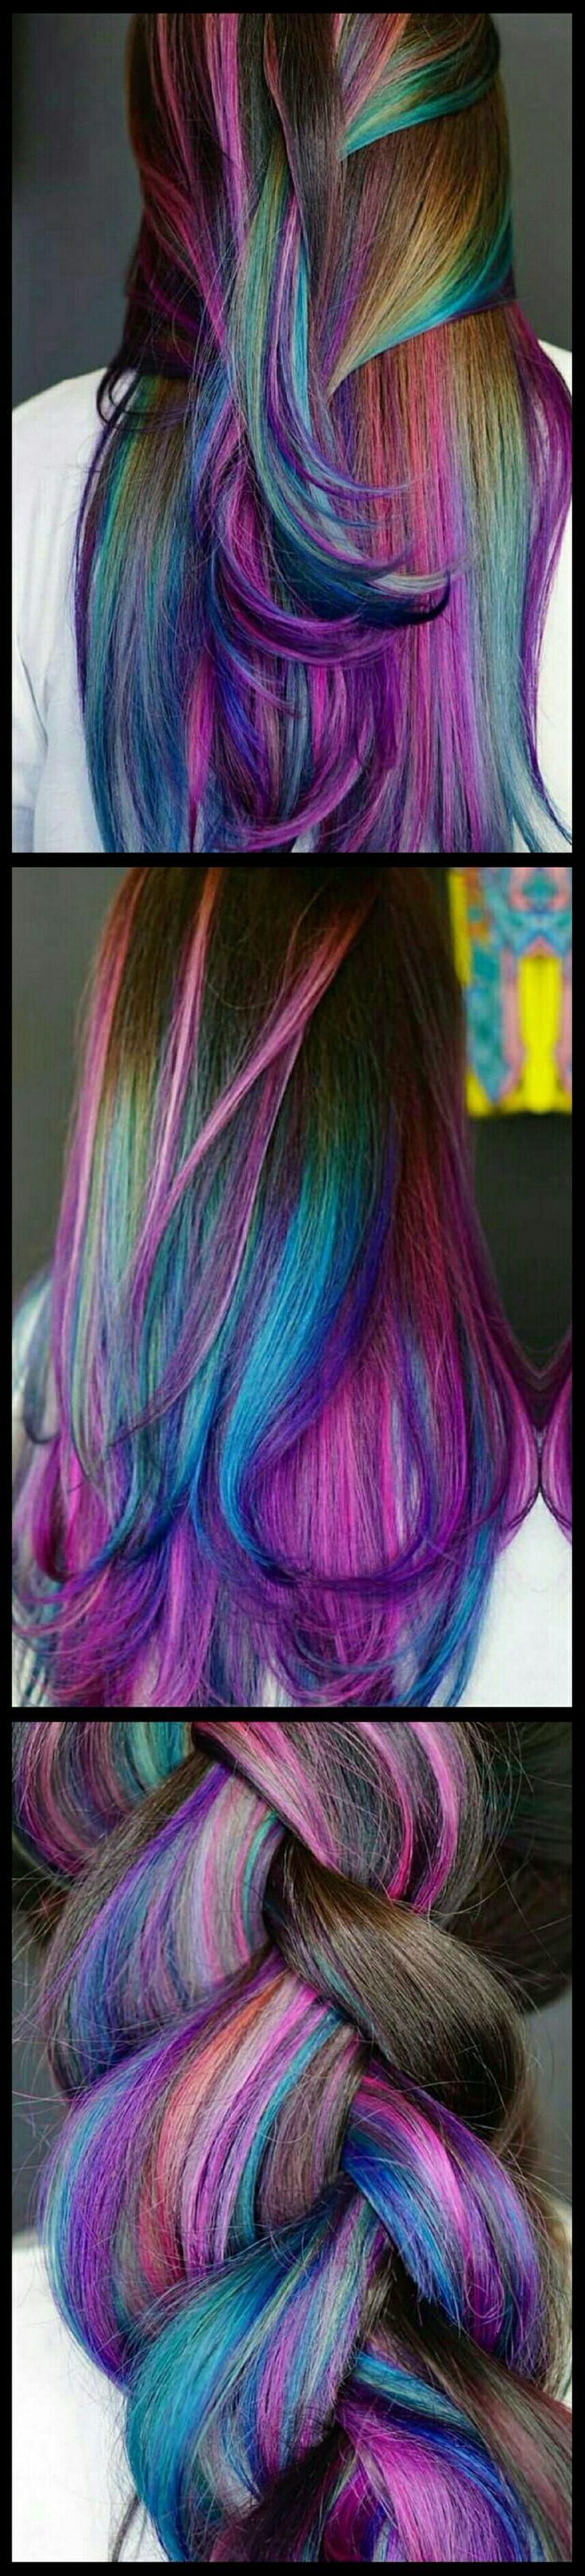 Purple blue mixed dyed hair @alix_maya